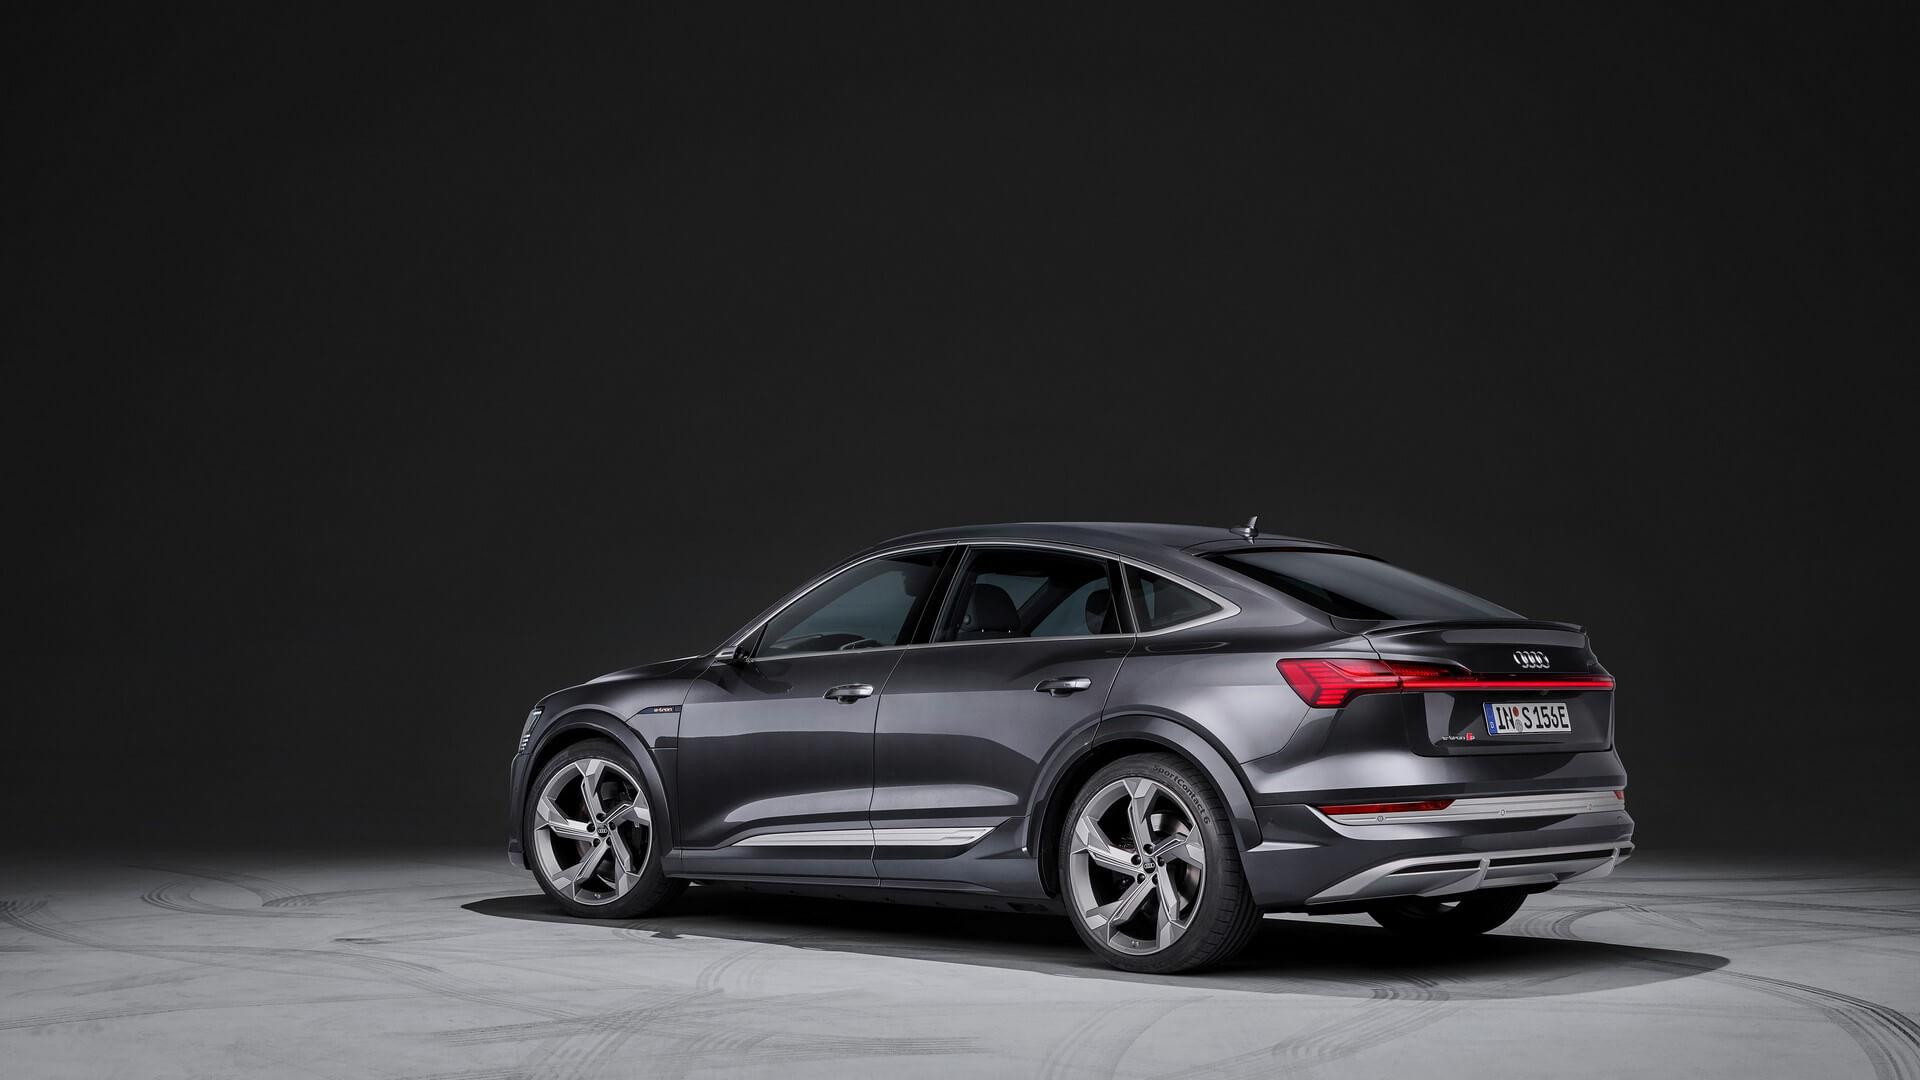 Audi-E-Tron-S-and-E-Tron-S-Sportback-2020-65